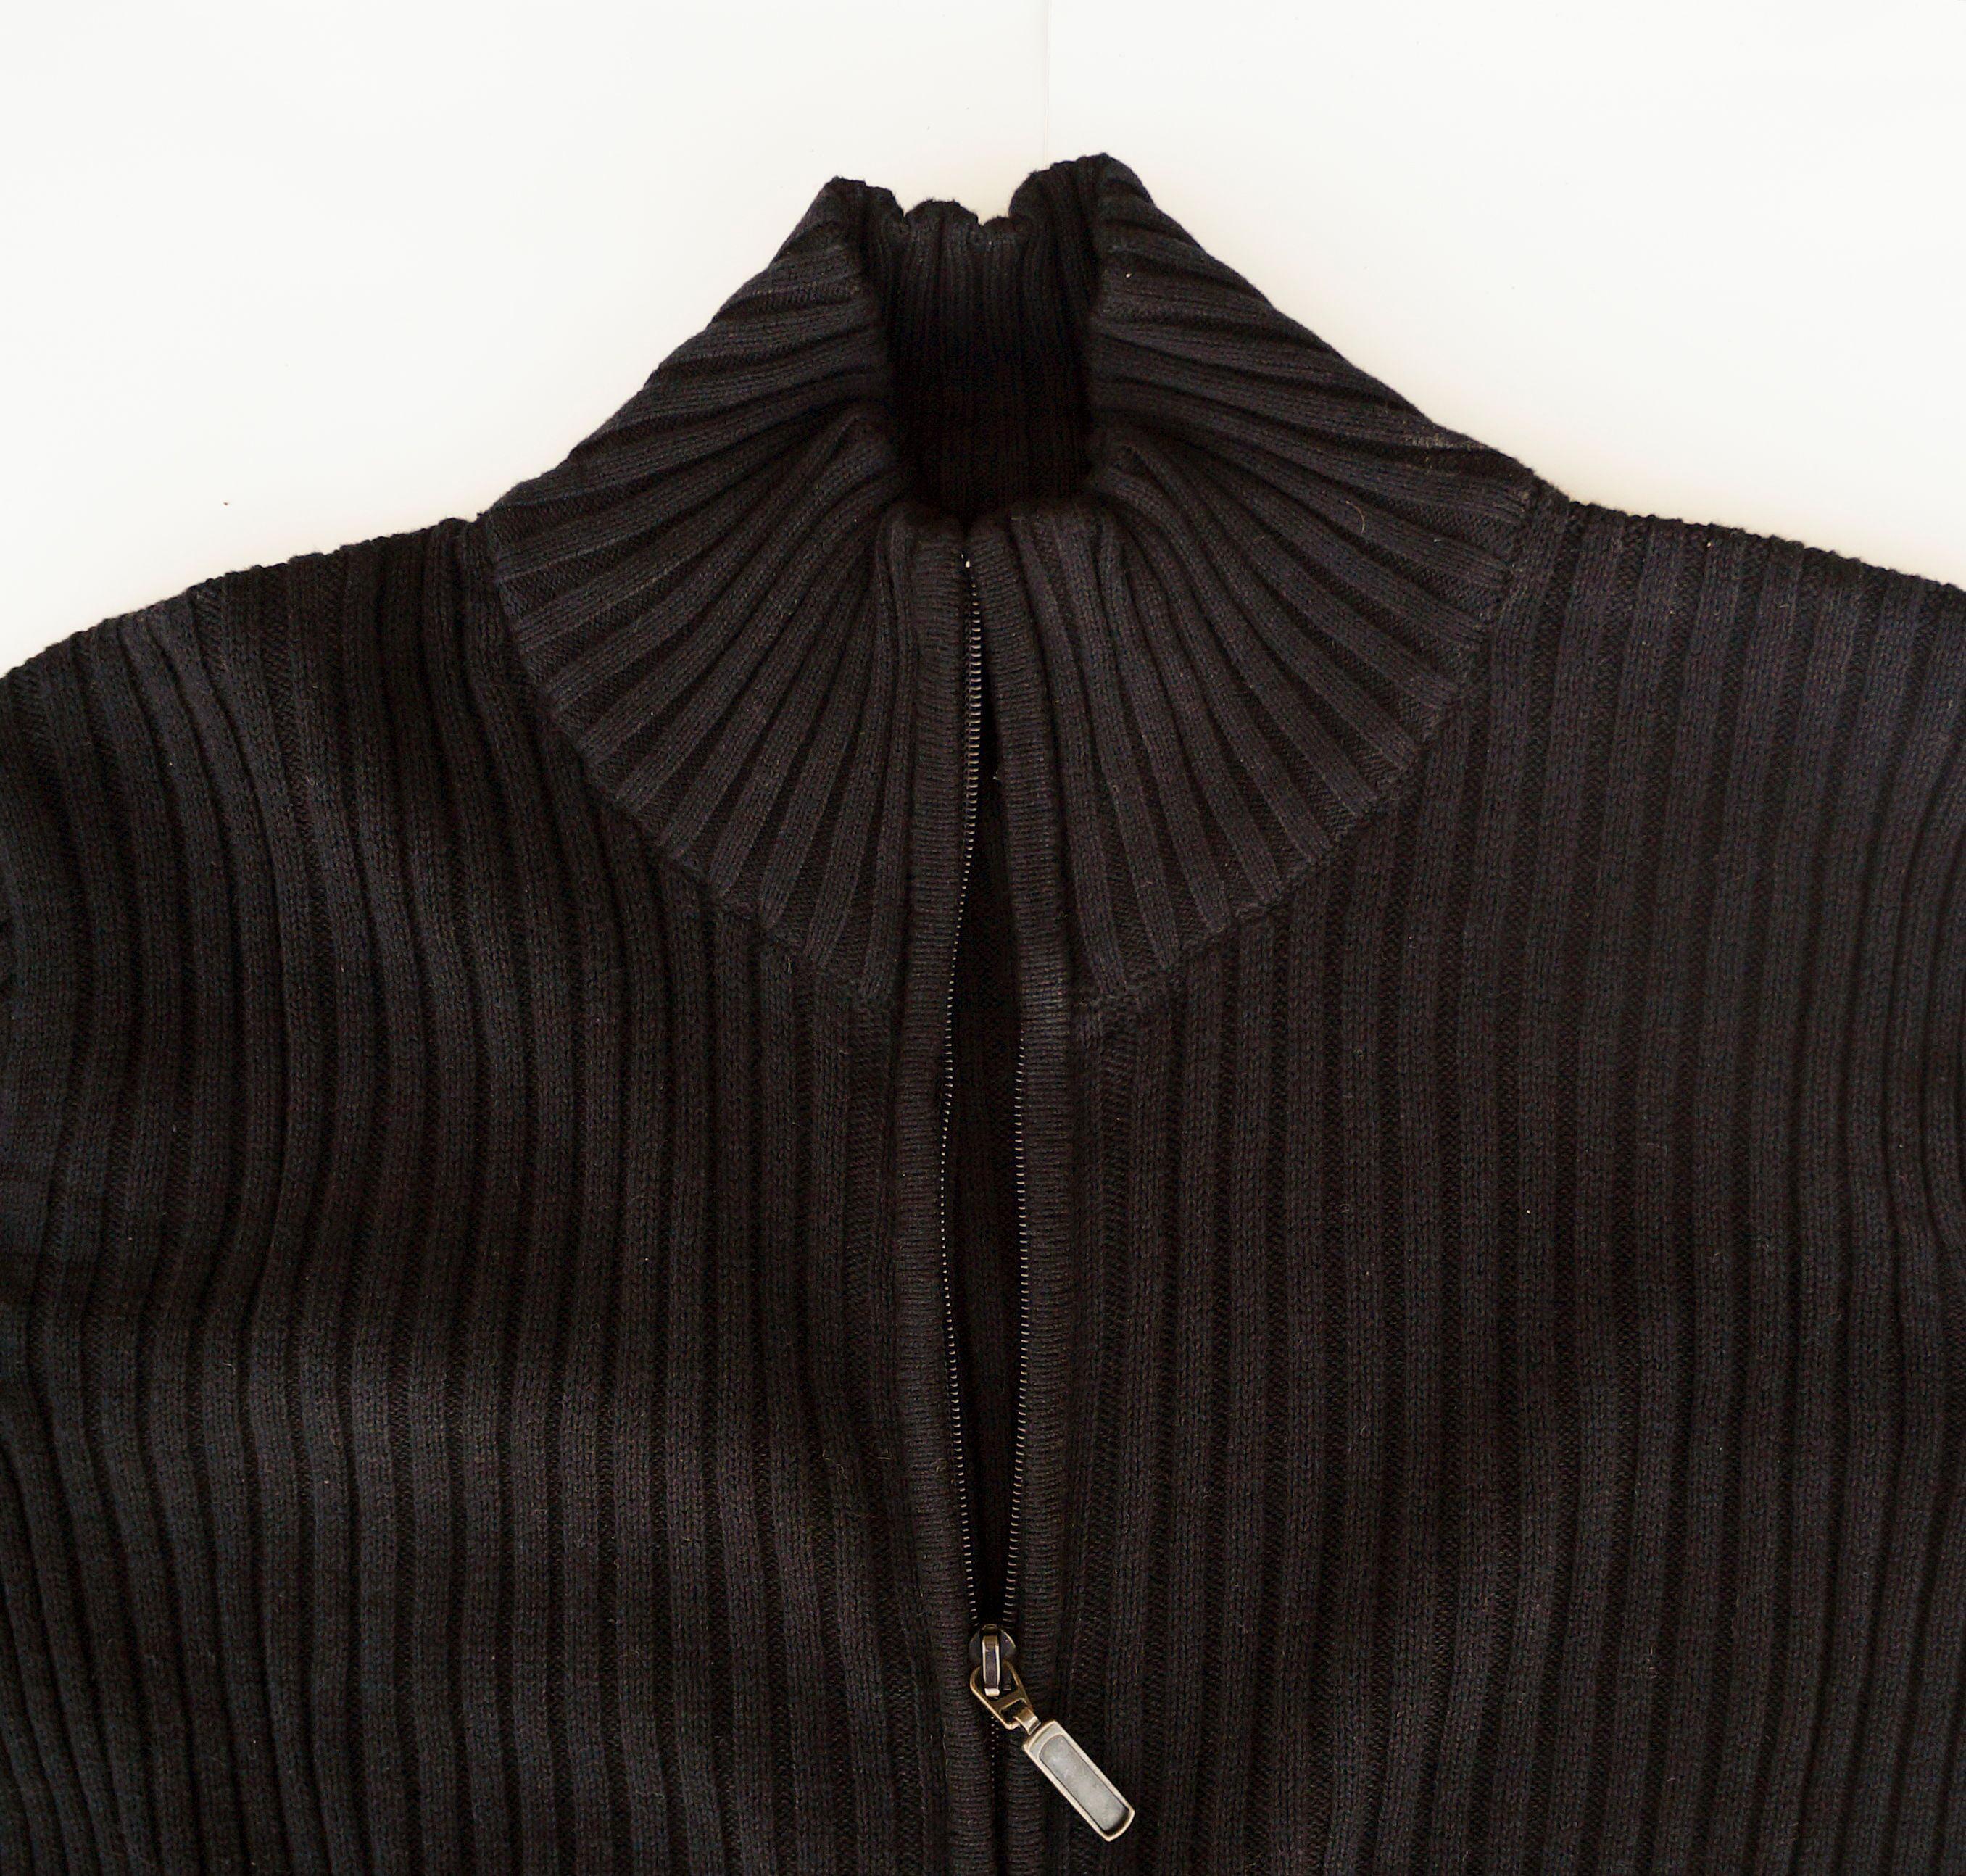 Marquis - Marquis Men s Full Zip Ribbed Mock Turtleneck 100% Cotton Cardigan  - Walmart.com b1289994d